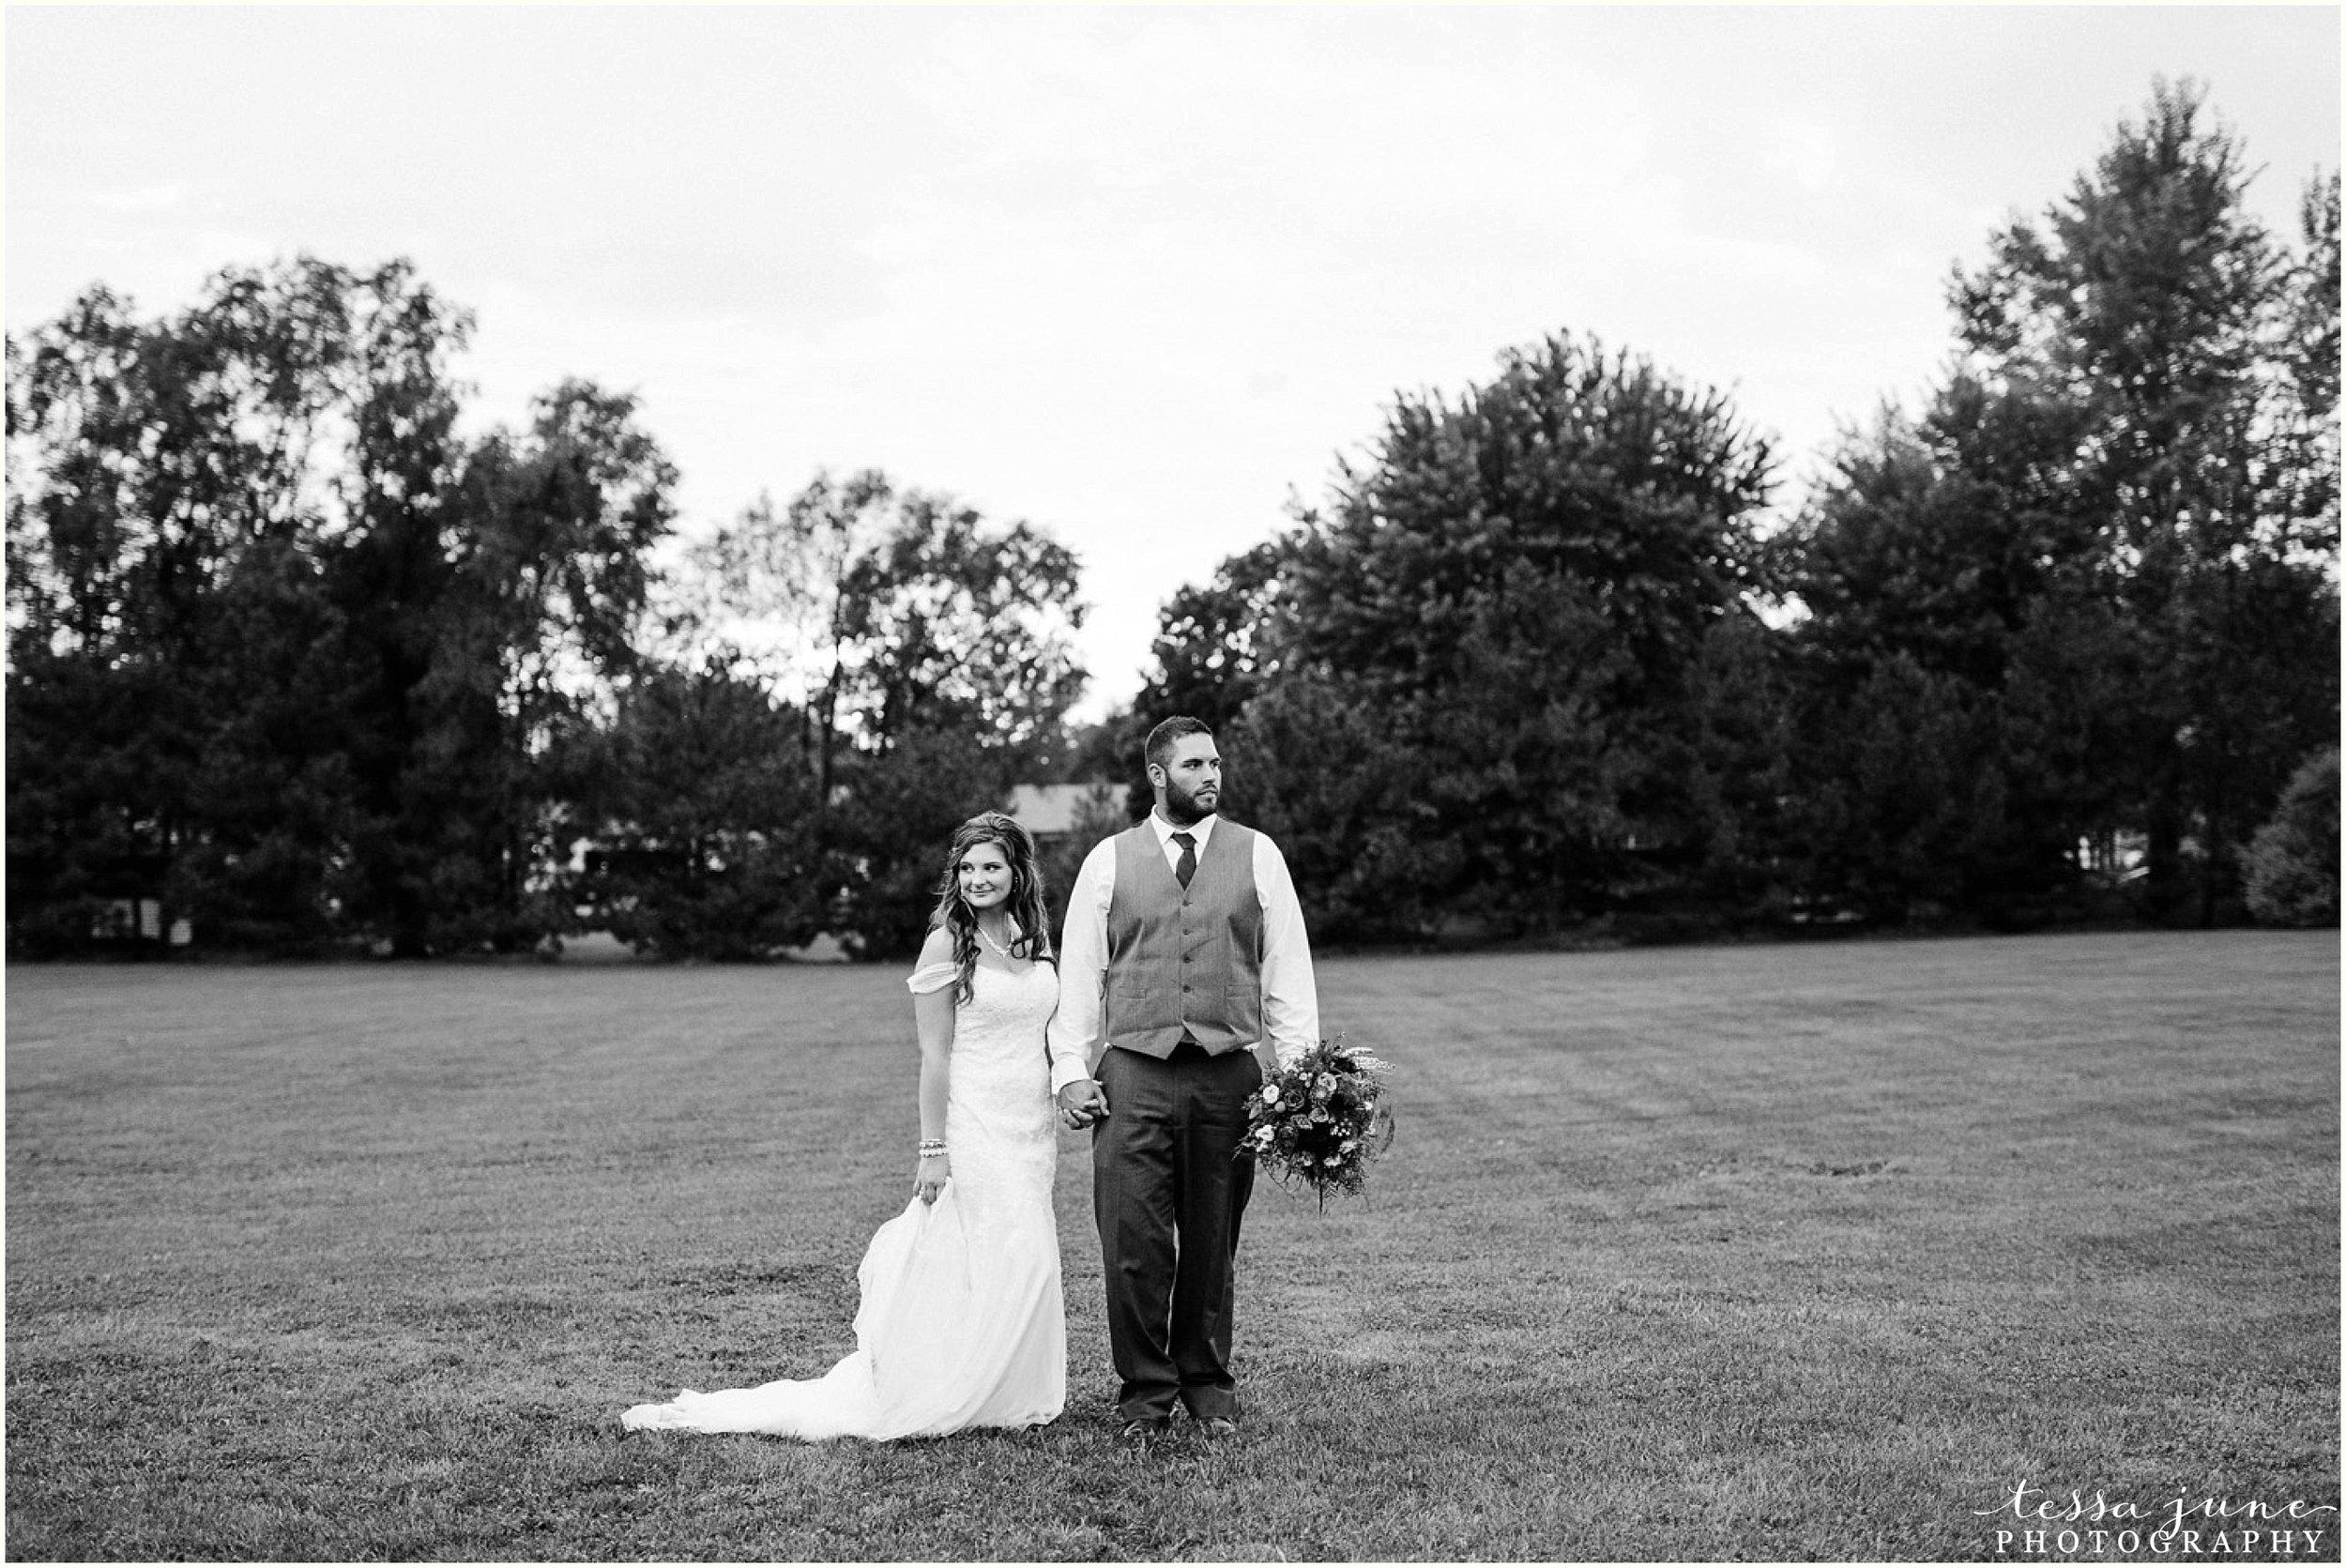 bohemian-minnesota-wedding-mismatched-bridesmaid-dresses-waterfall-st-cloud-tessa-june-photography-184.jpg